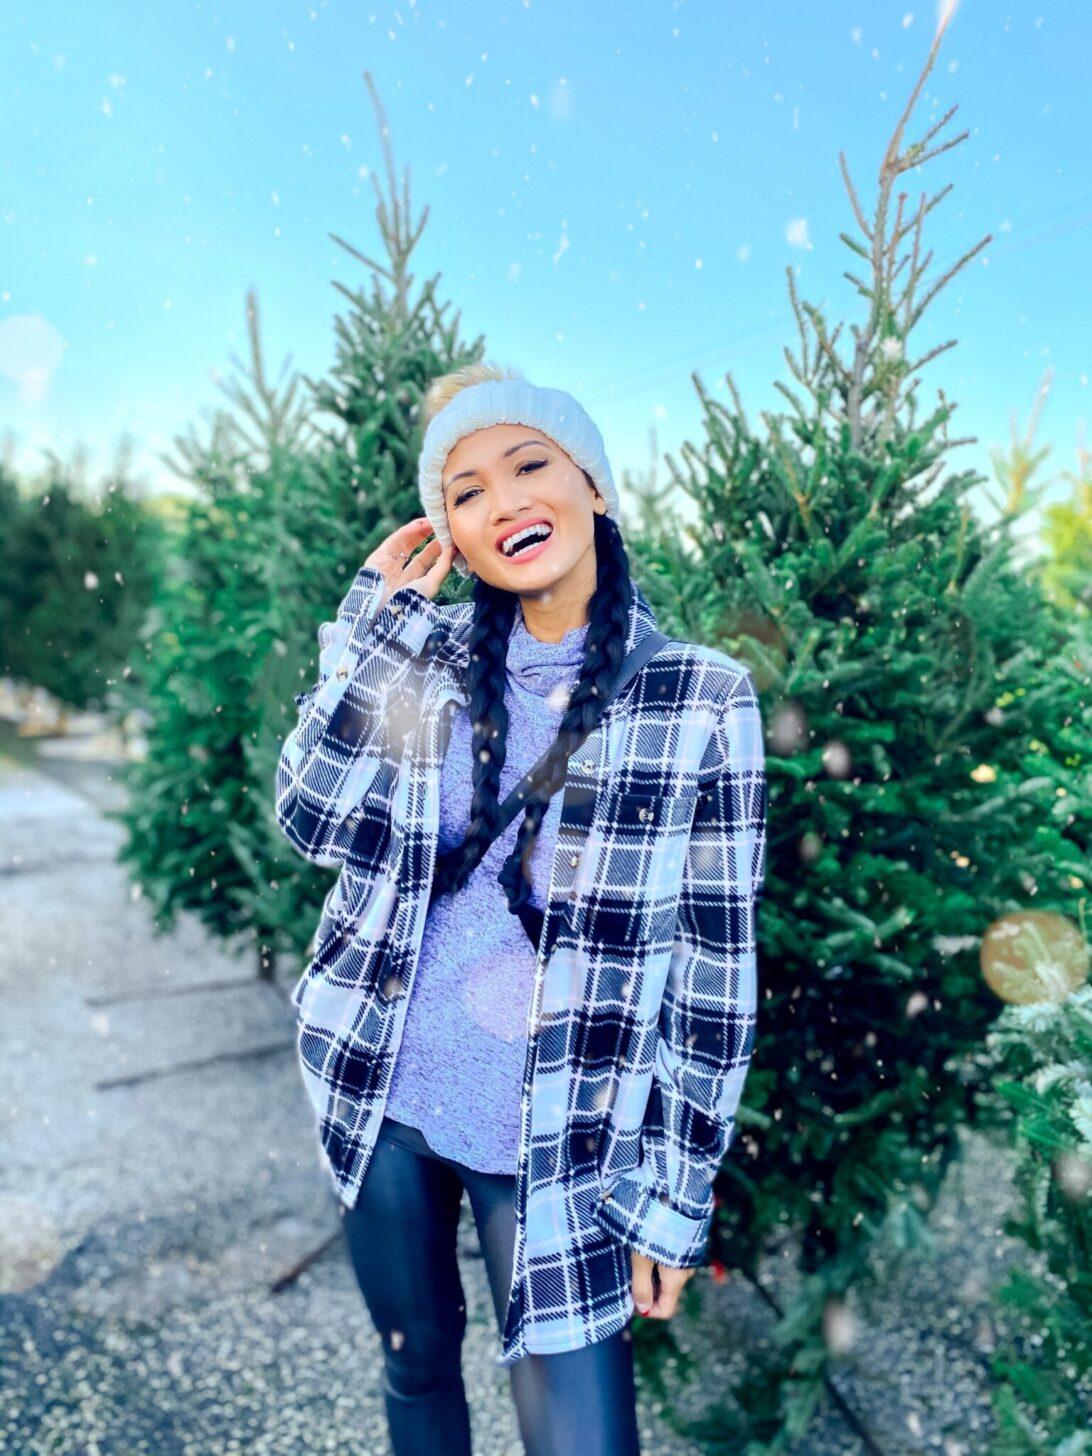 winter styles under $25, shacked, plaid shirt, white pom beanie